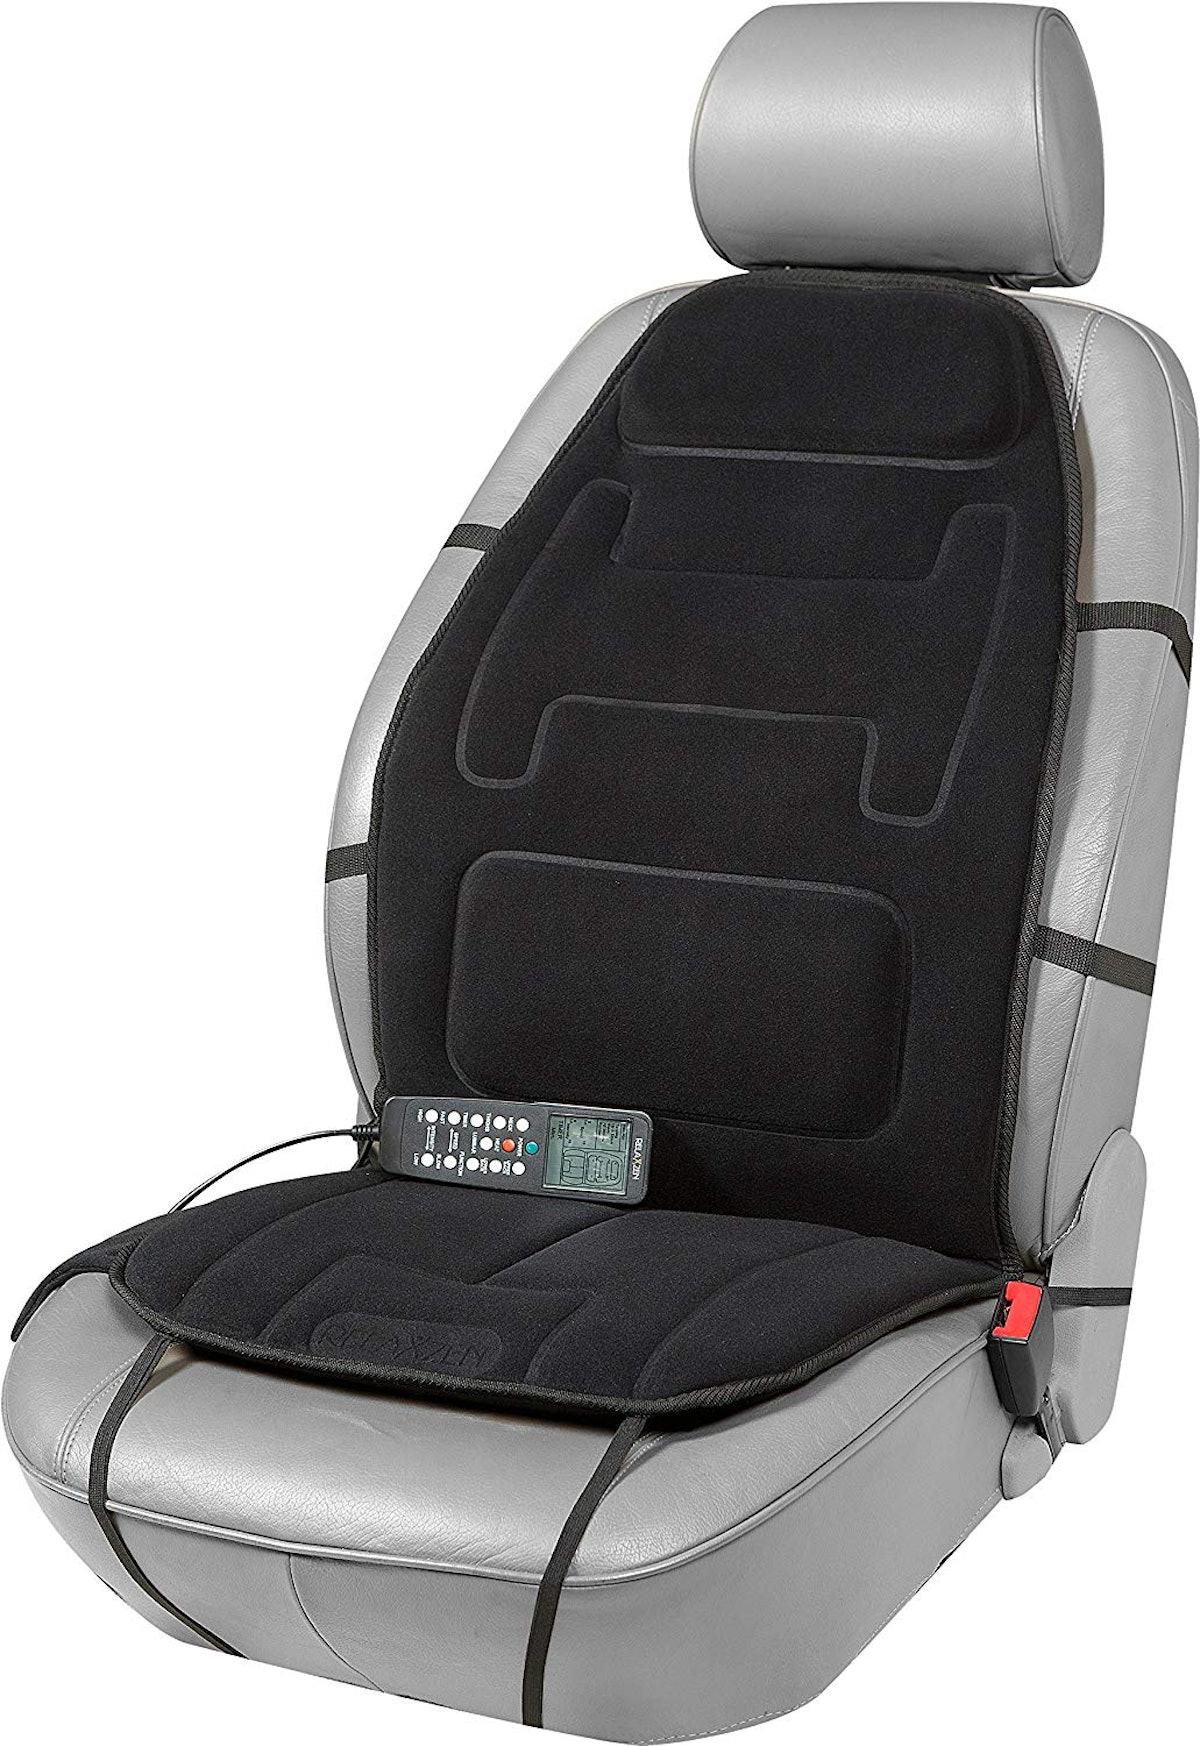 Comfort Products Massage Seat Cushion